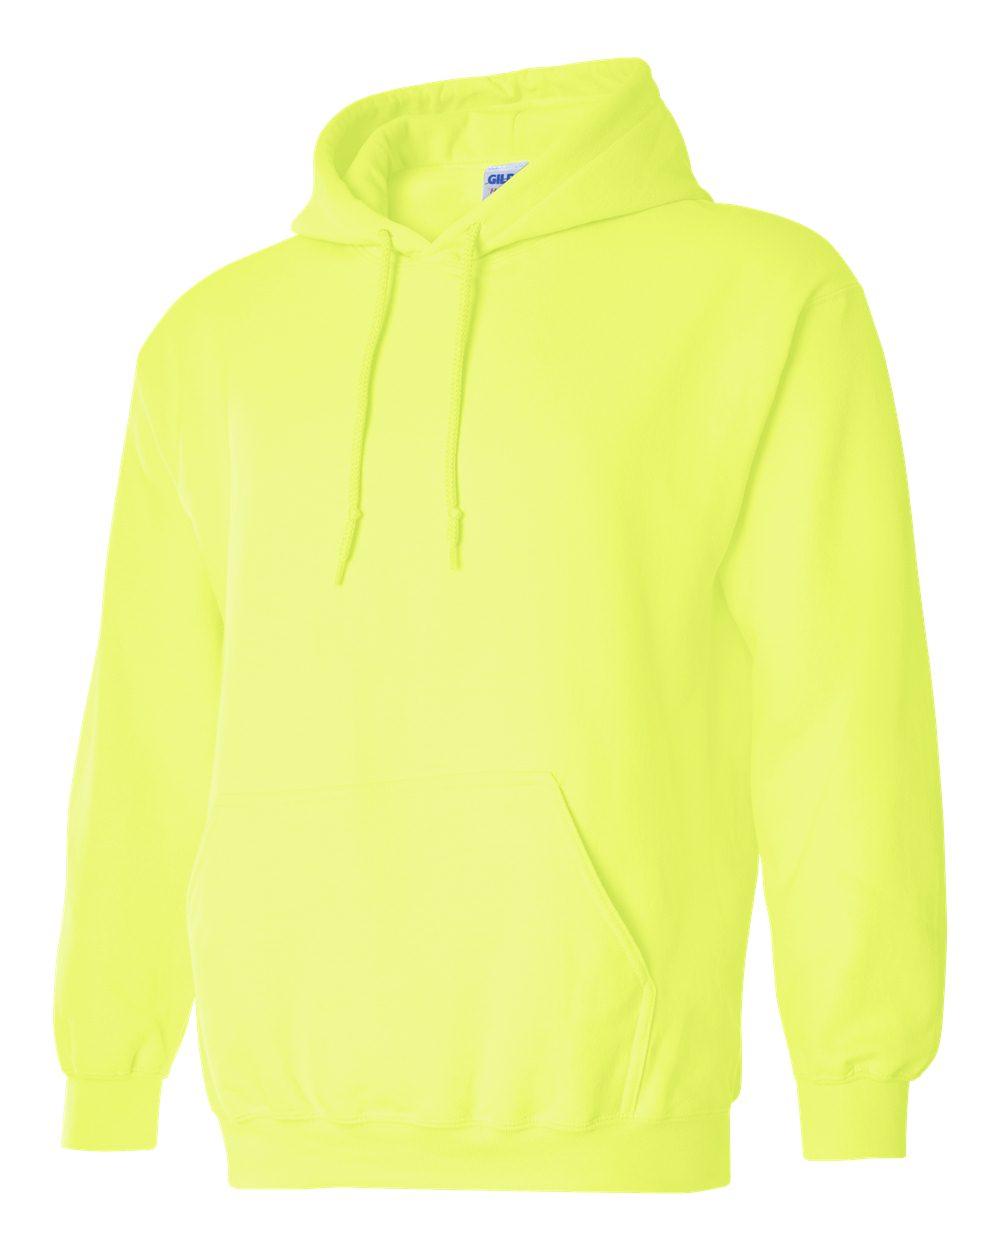 GI18500 Safety Yellow